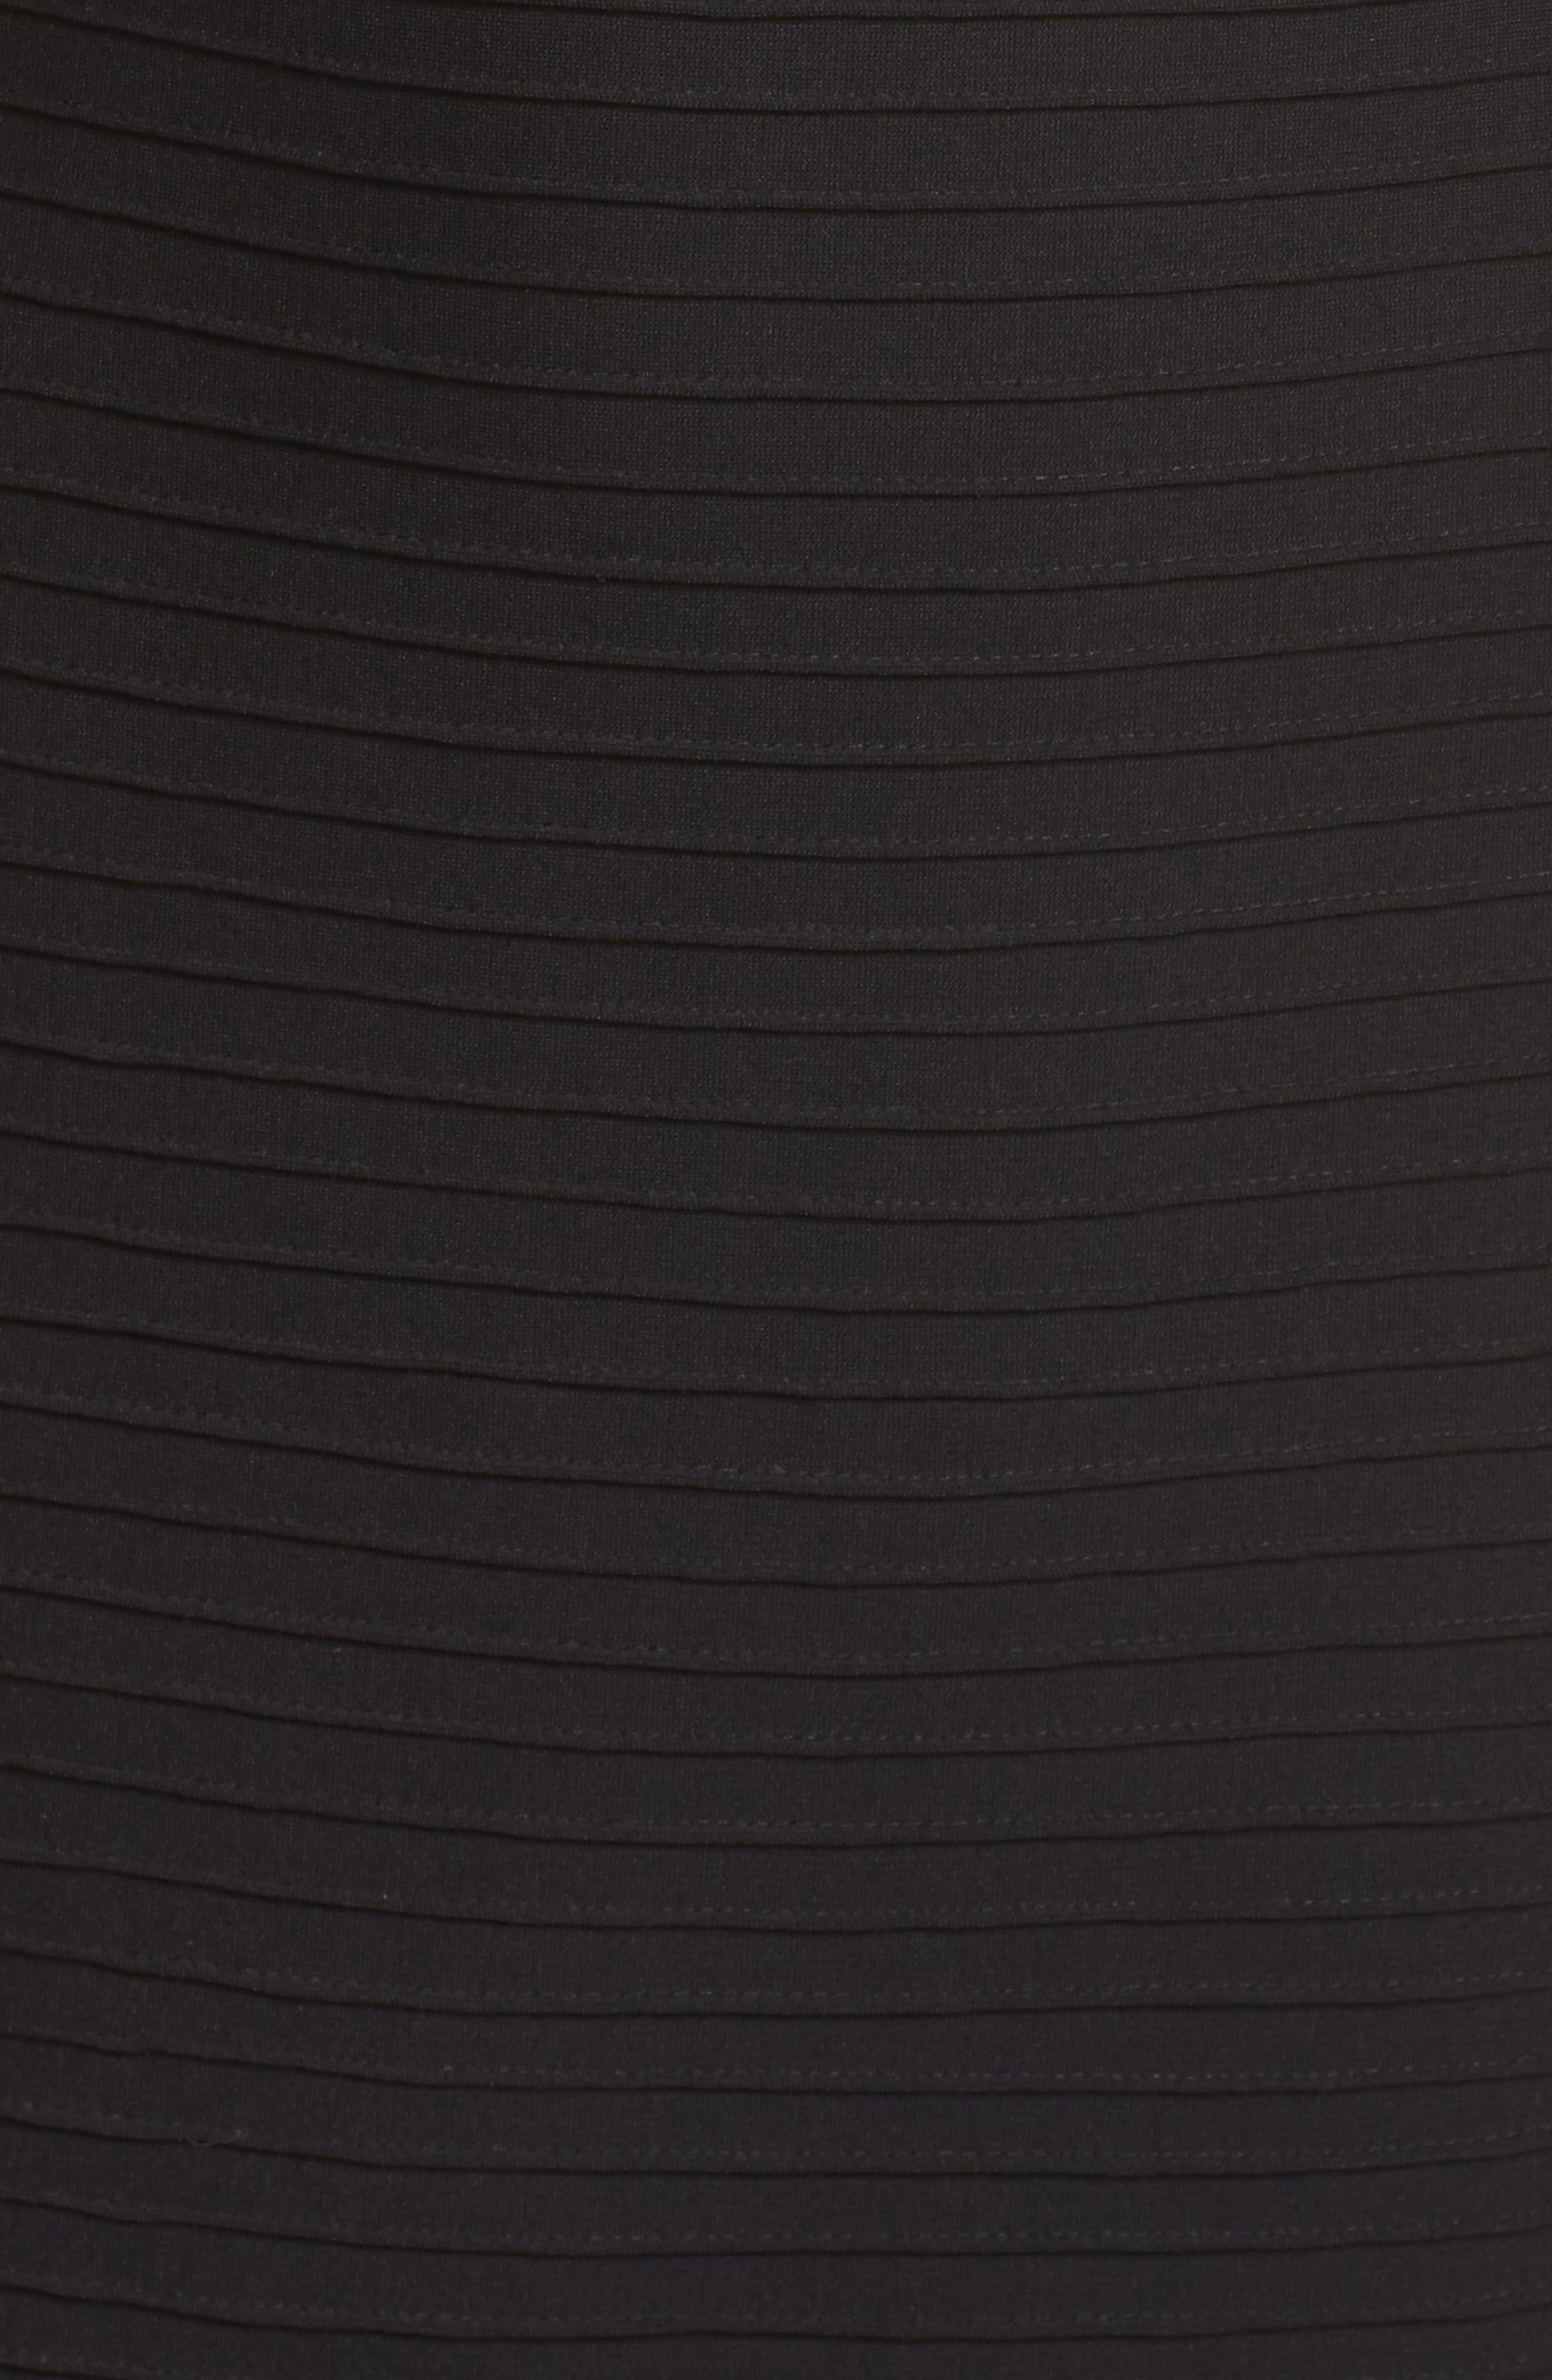 Pintuck Off the Shoulder Sheath Dress,                             Alternate thumbnail 5, color,                             001